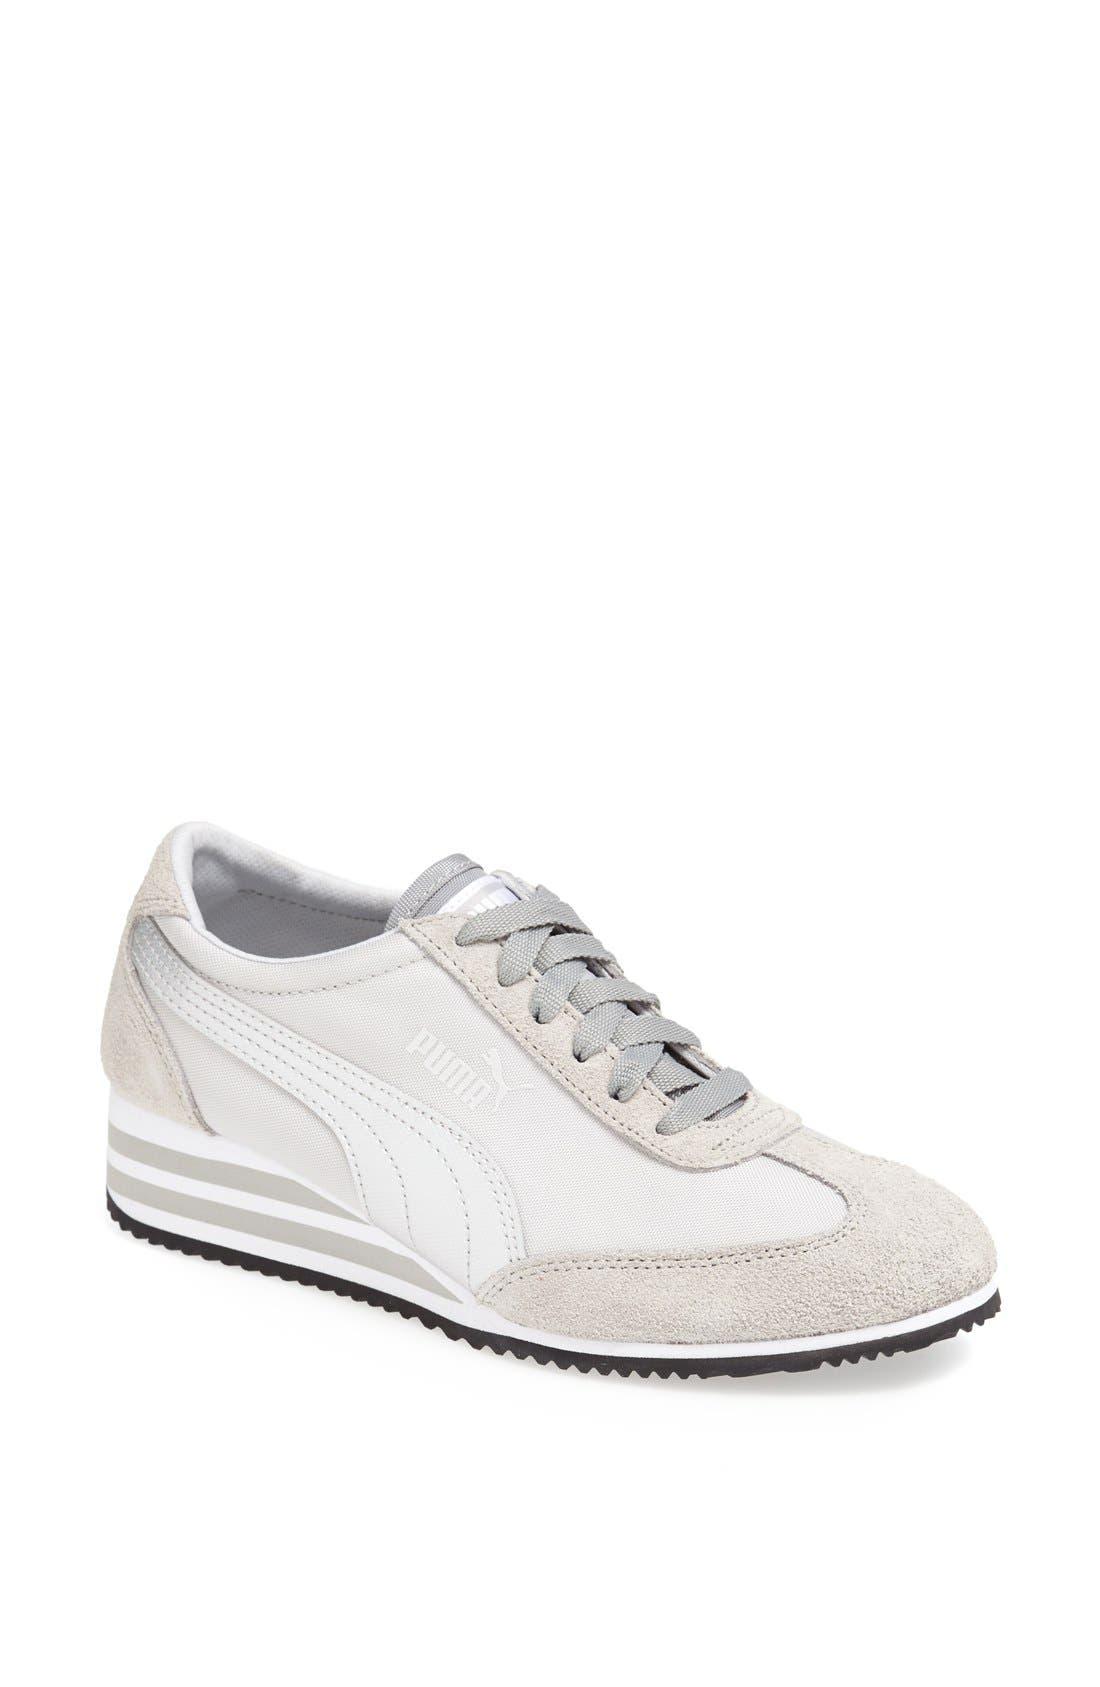 Alternate Image 1 Selected - PUMA 'Caroline Stripe' Sneaker (Women)